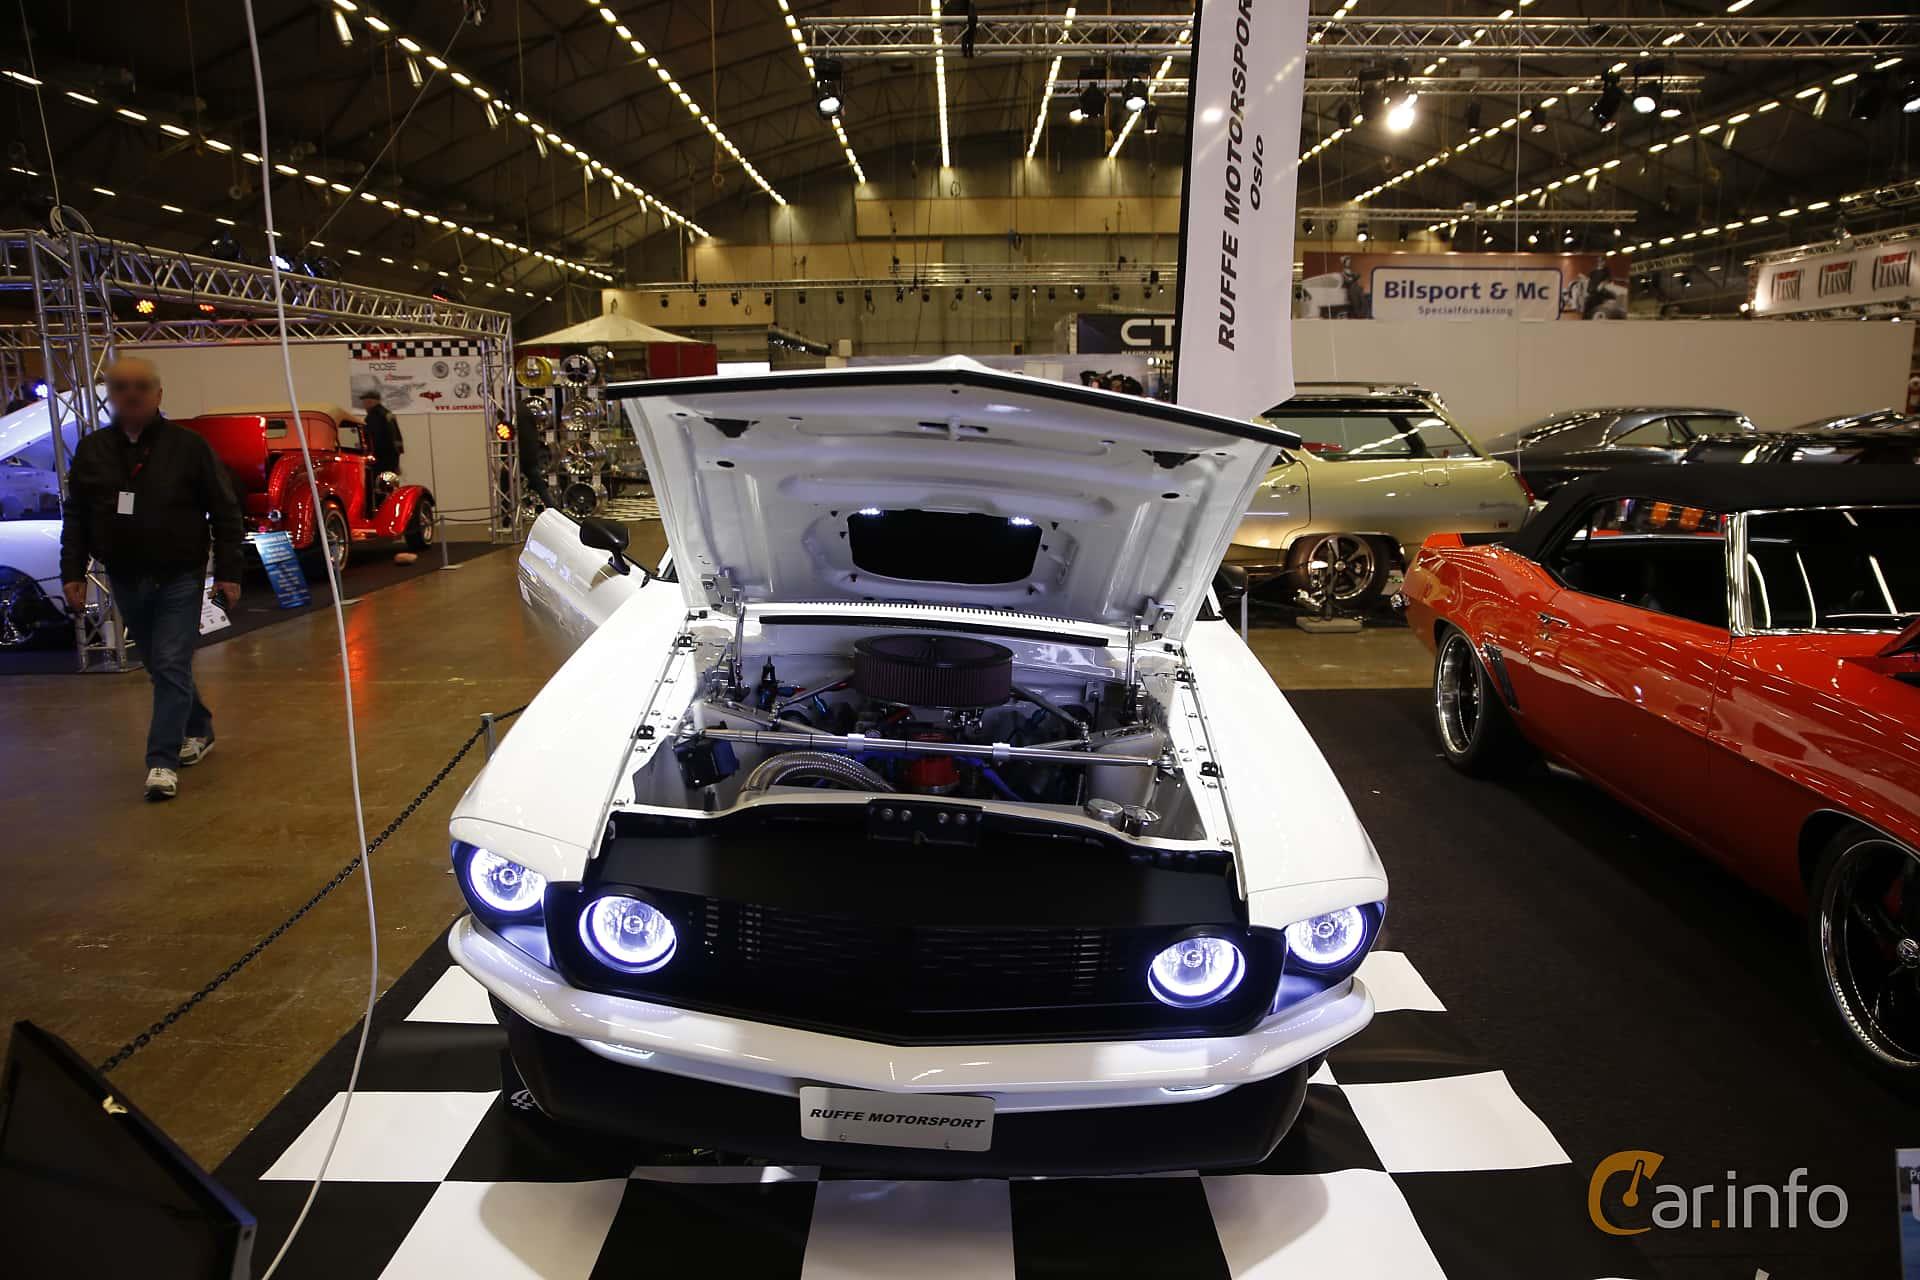 Front of ford mustang 5 8 v8 254ps 1969 at bilsport performance custom motor show